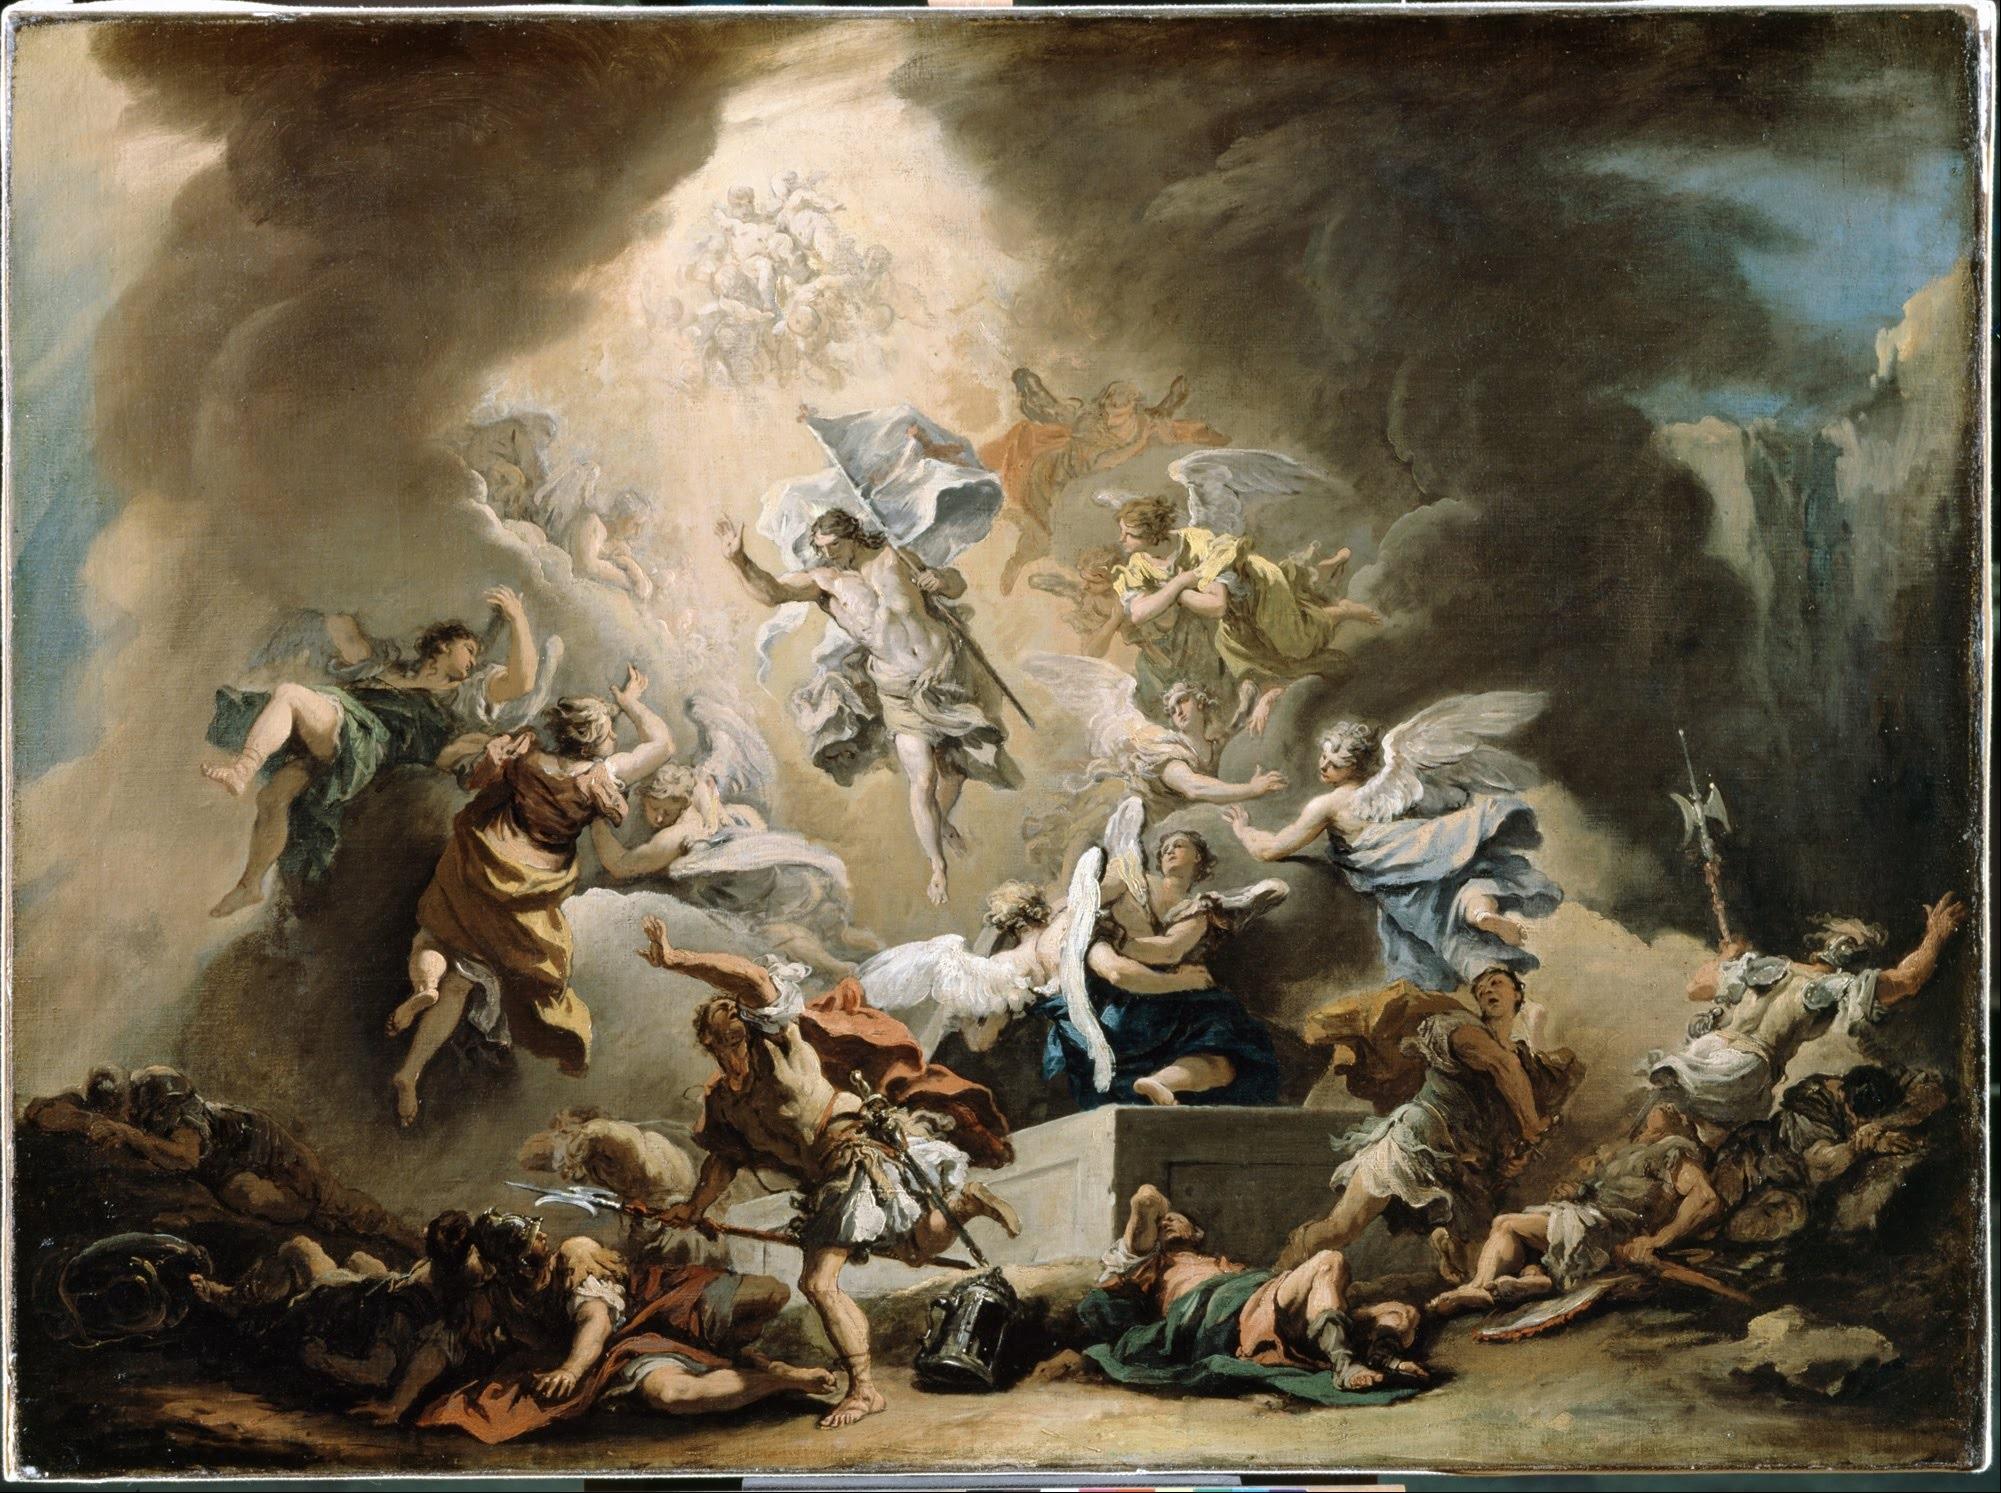 rev. 20.5 - first resurrection